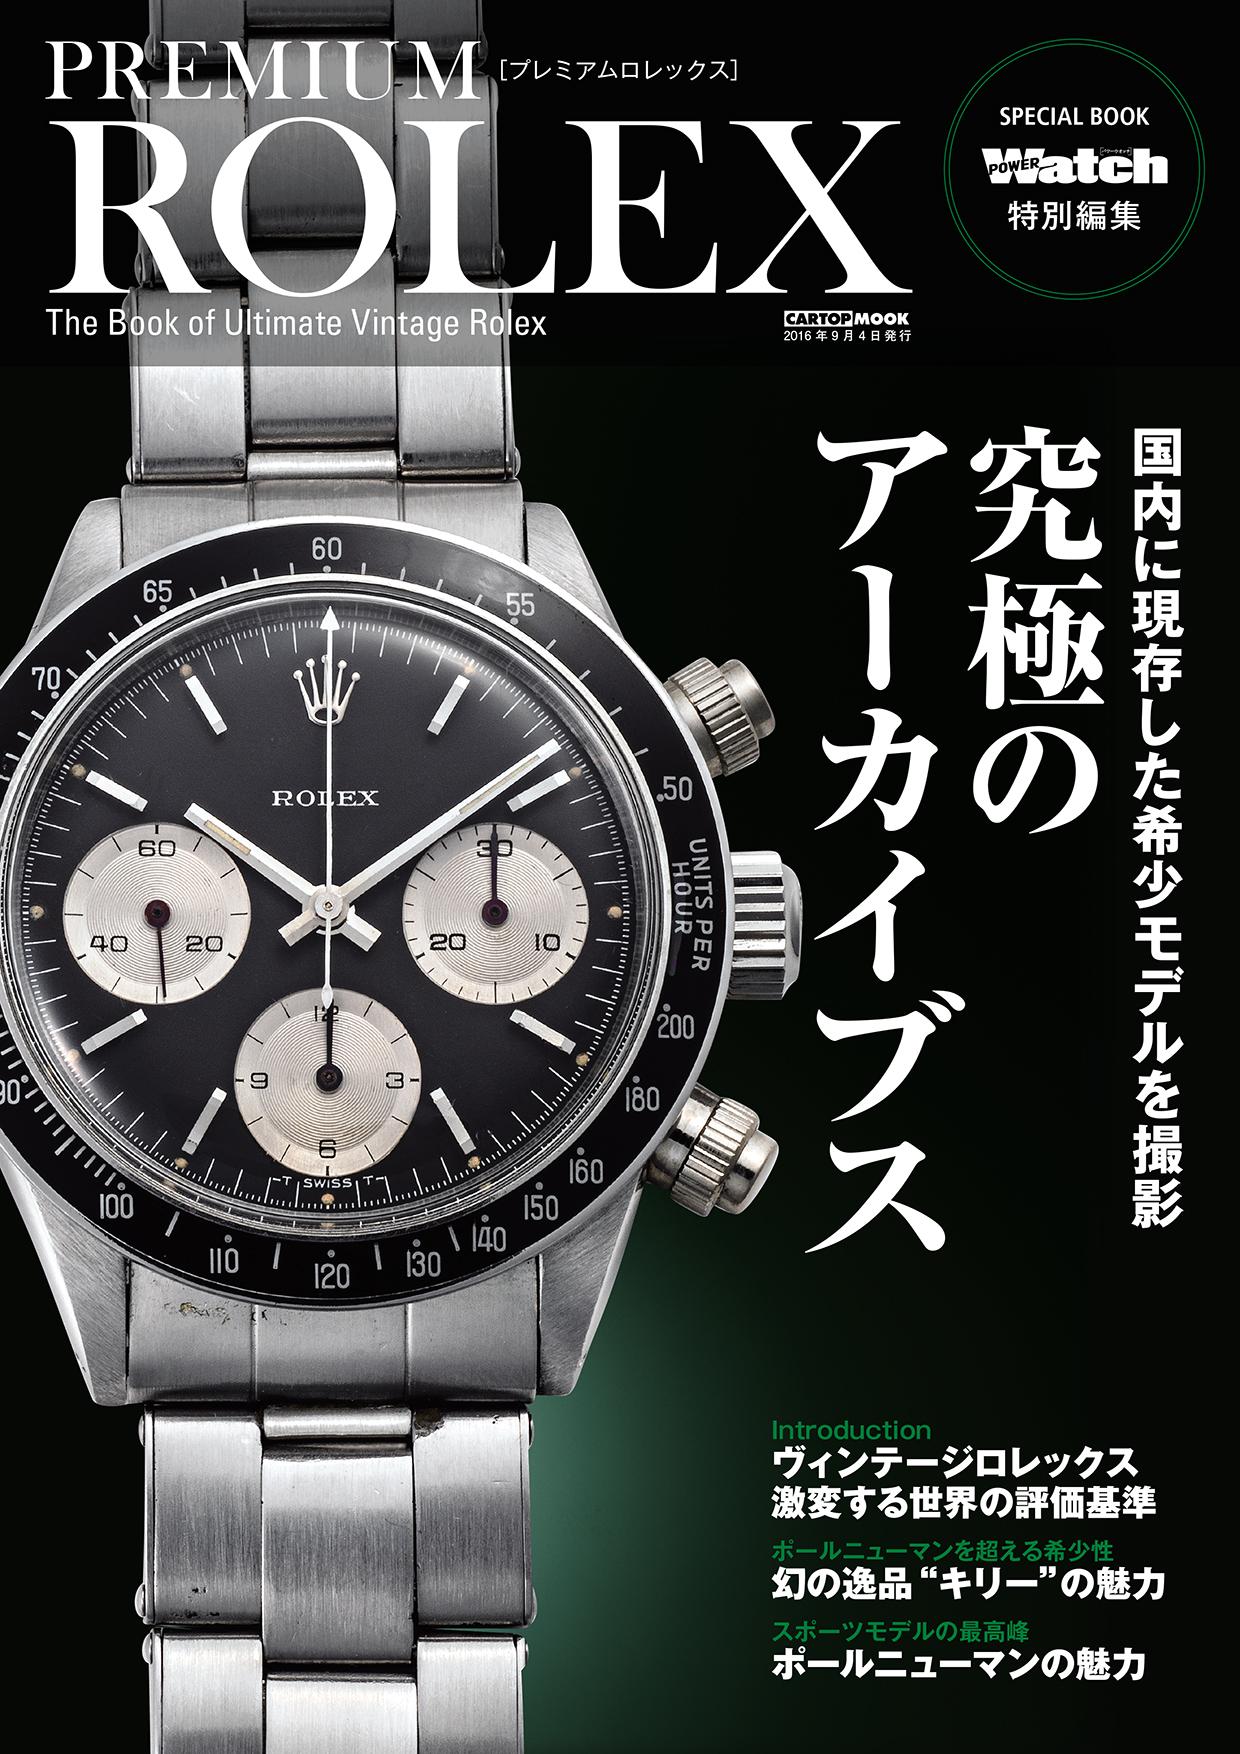 Premium ROLEX|プレミアムロレックス 特別編集